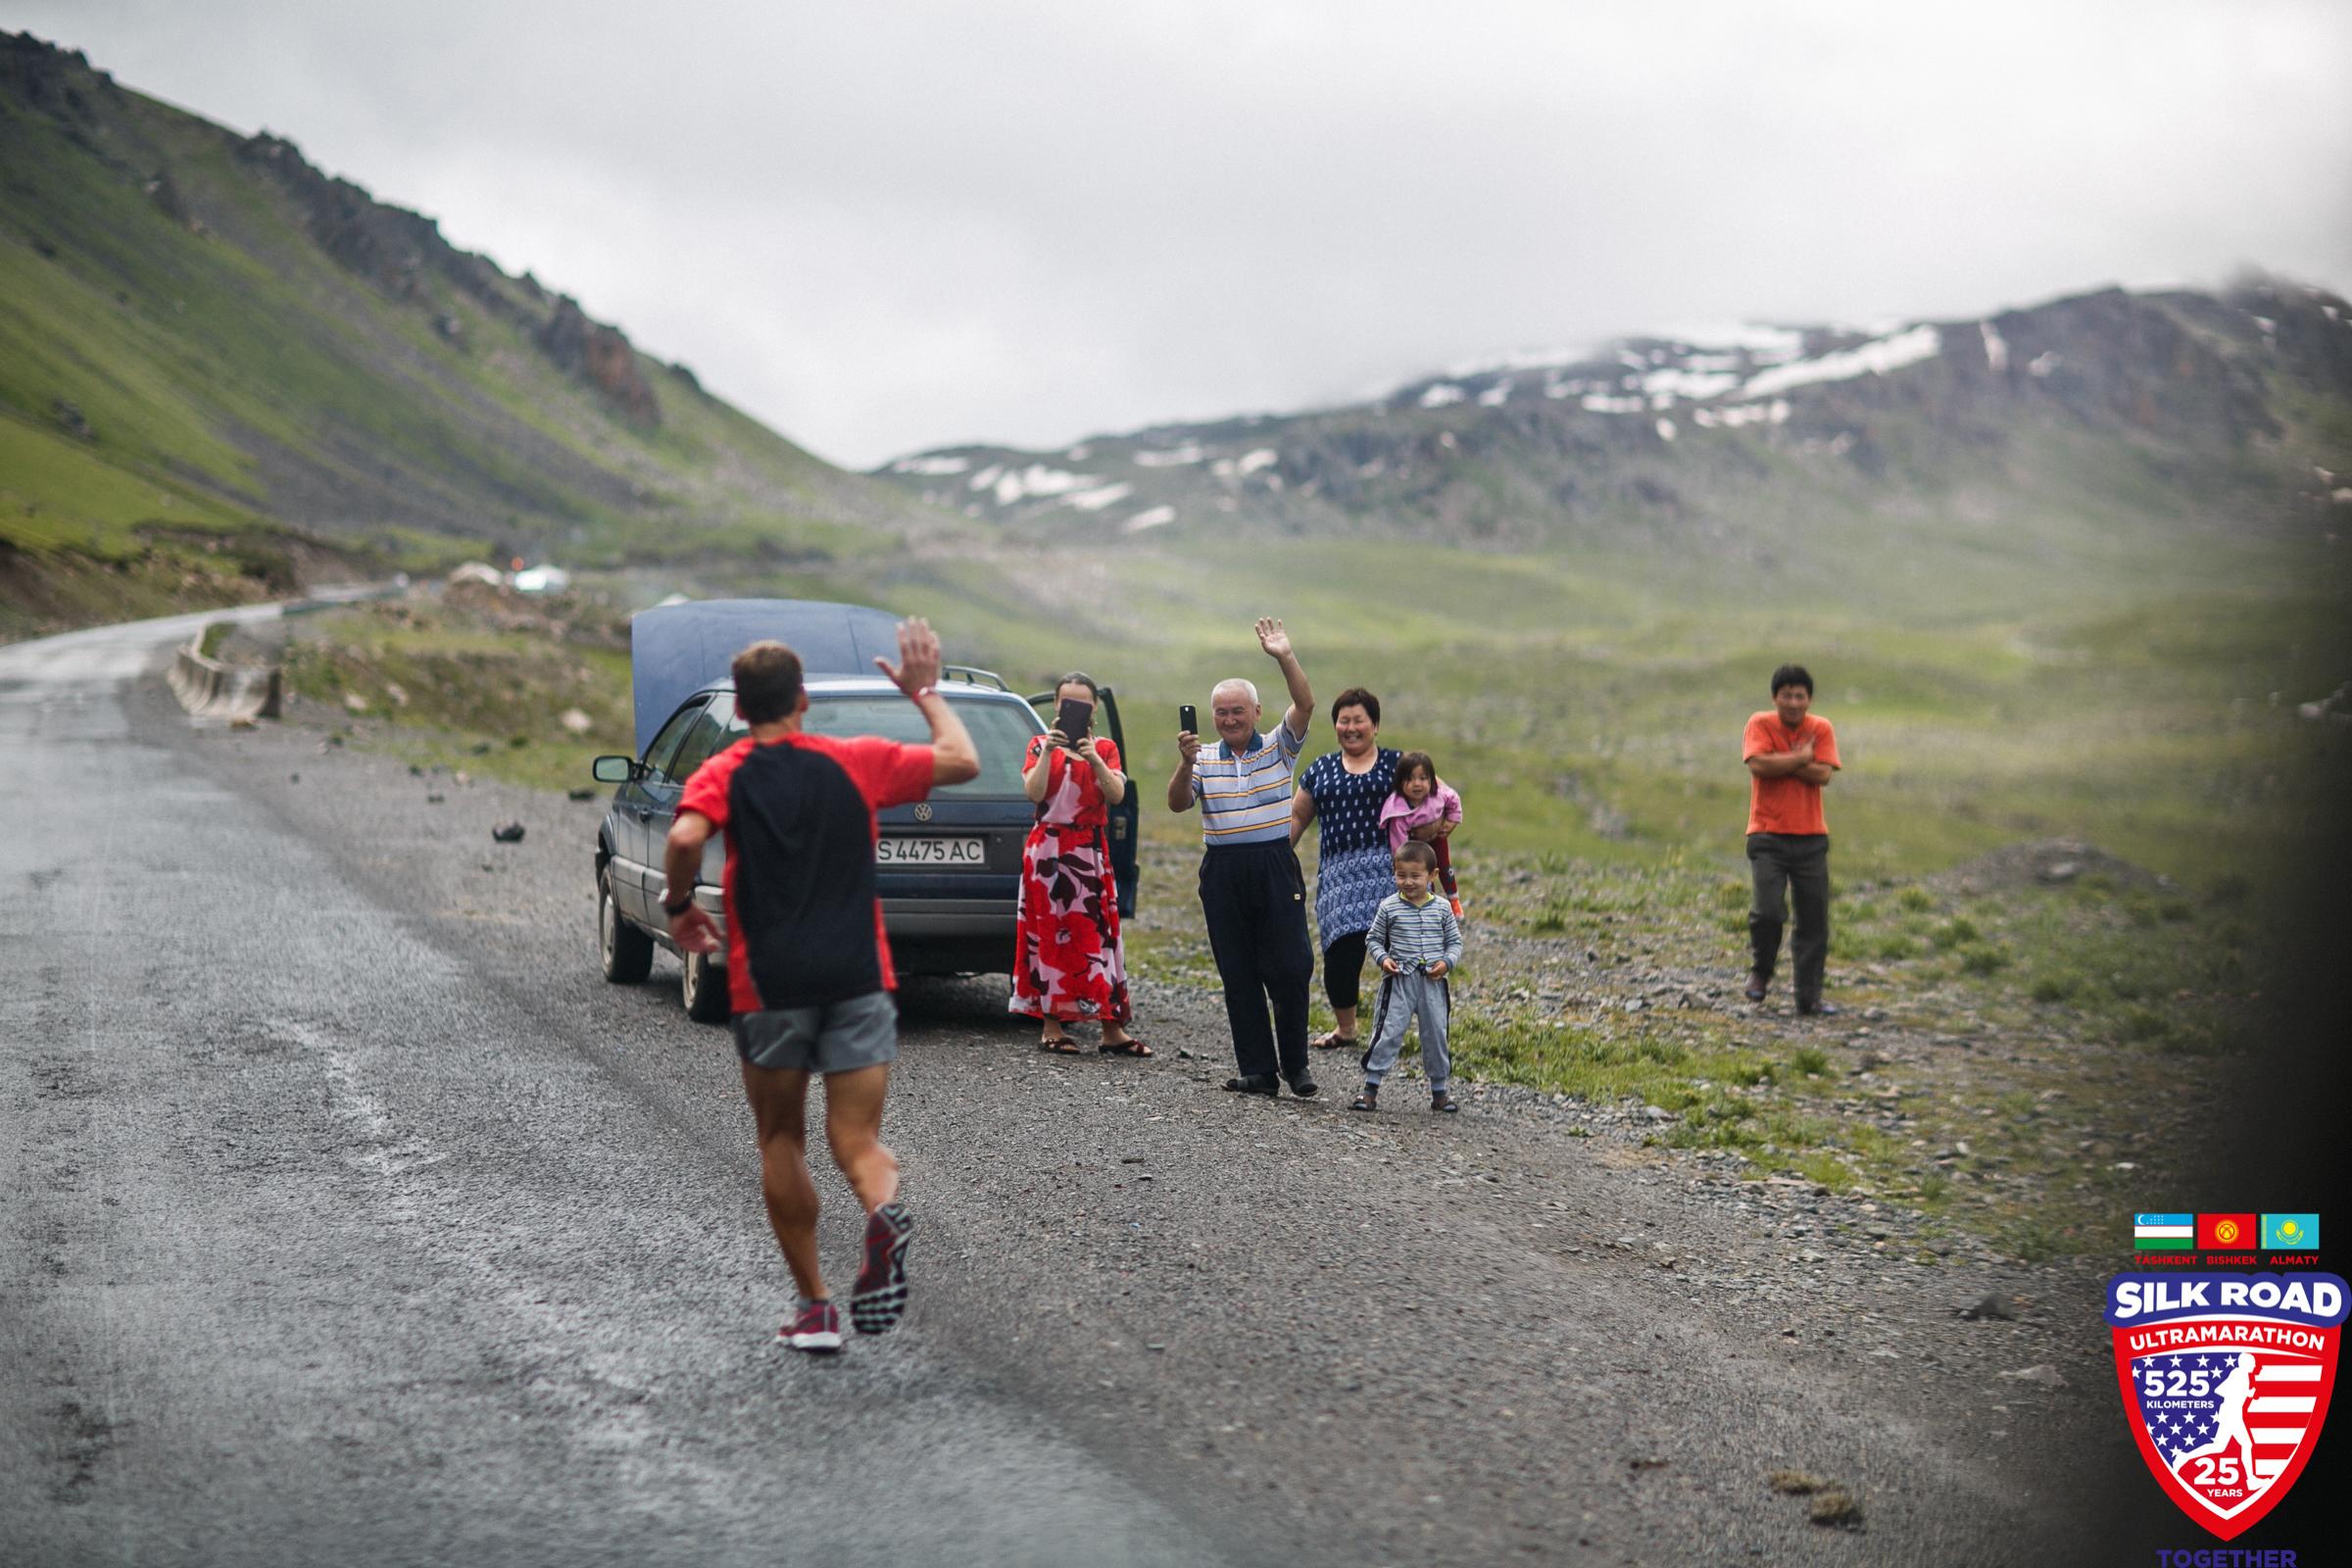 A Kyrgyz family stops to capture photos of Dean as he runs by